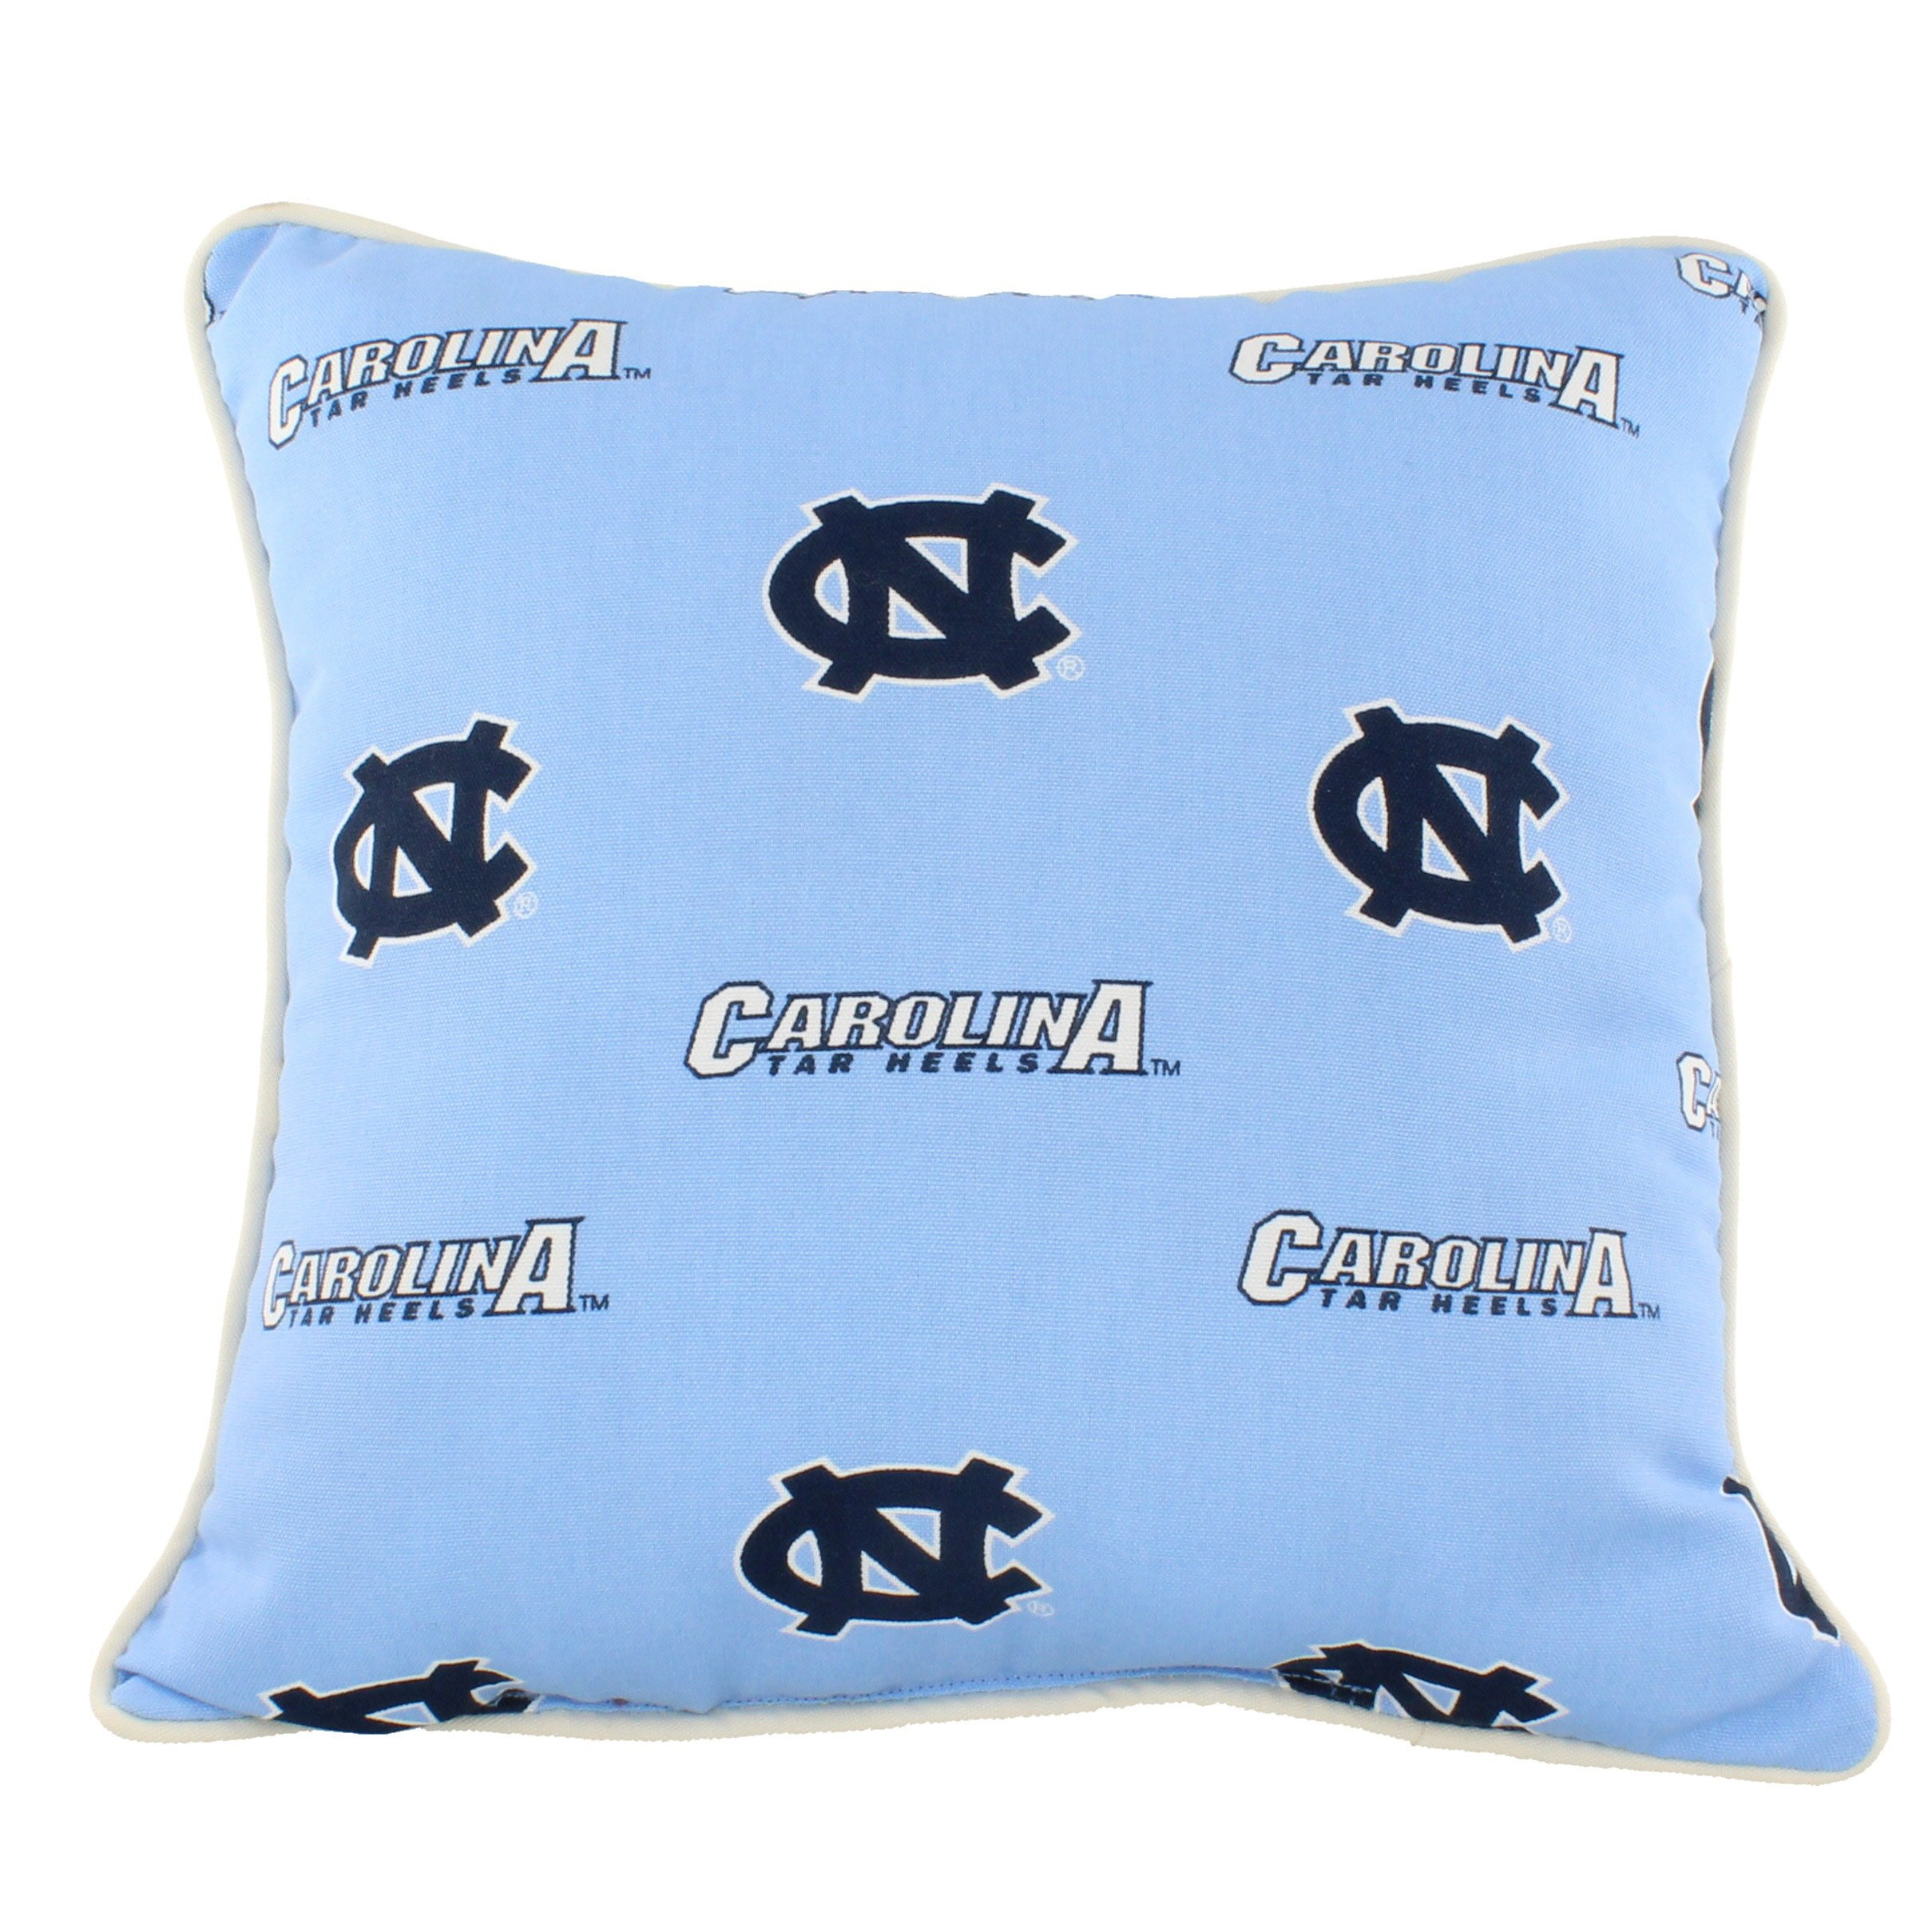 College Covers NCUODP North Carolina Tar Heels Outdoor Decorative Pillow, 16'' x 16'', Blue